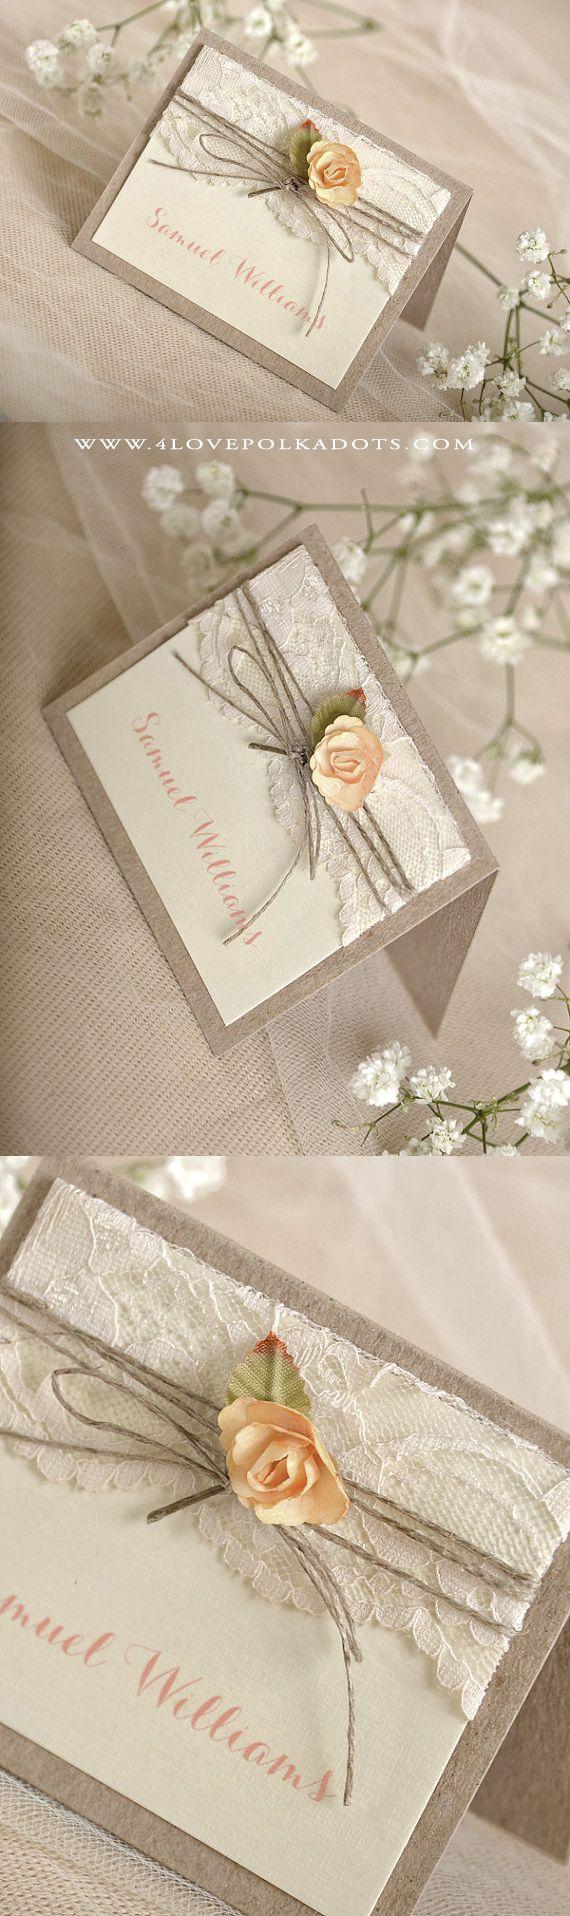 Lovely Place Card with lace & rose #weddingideas #romantic #rusticwedding